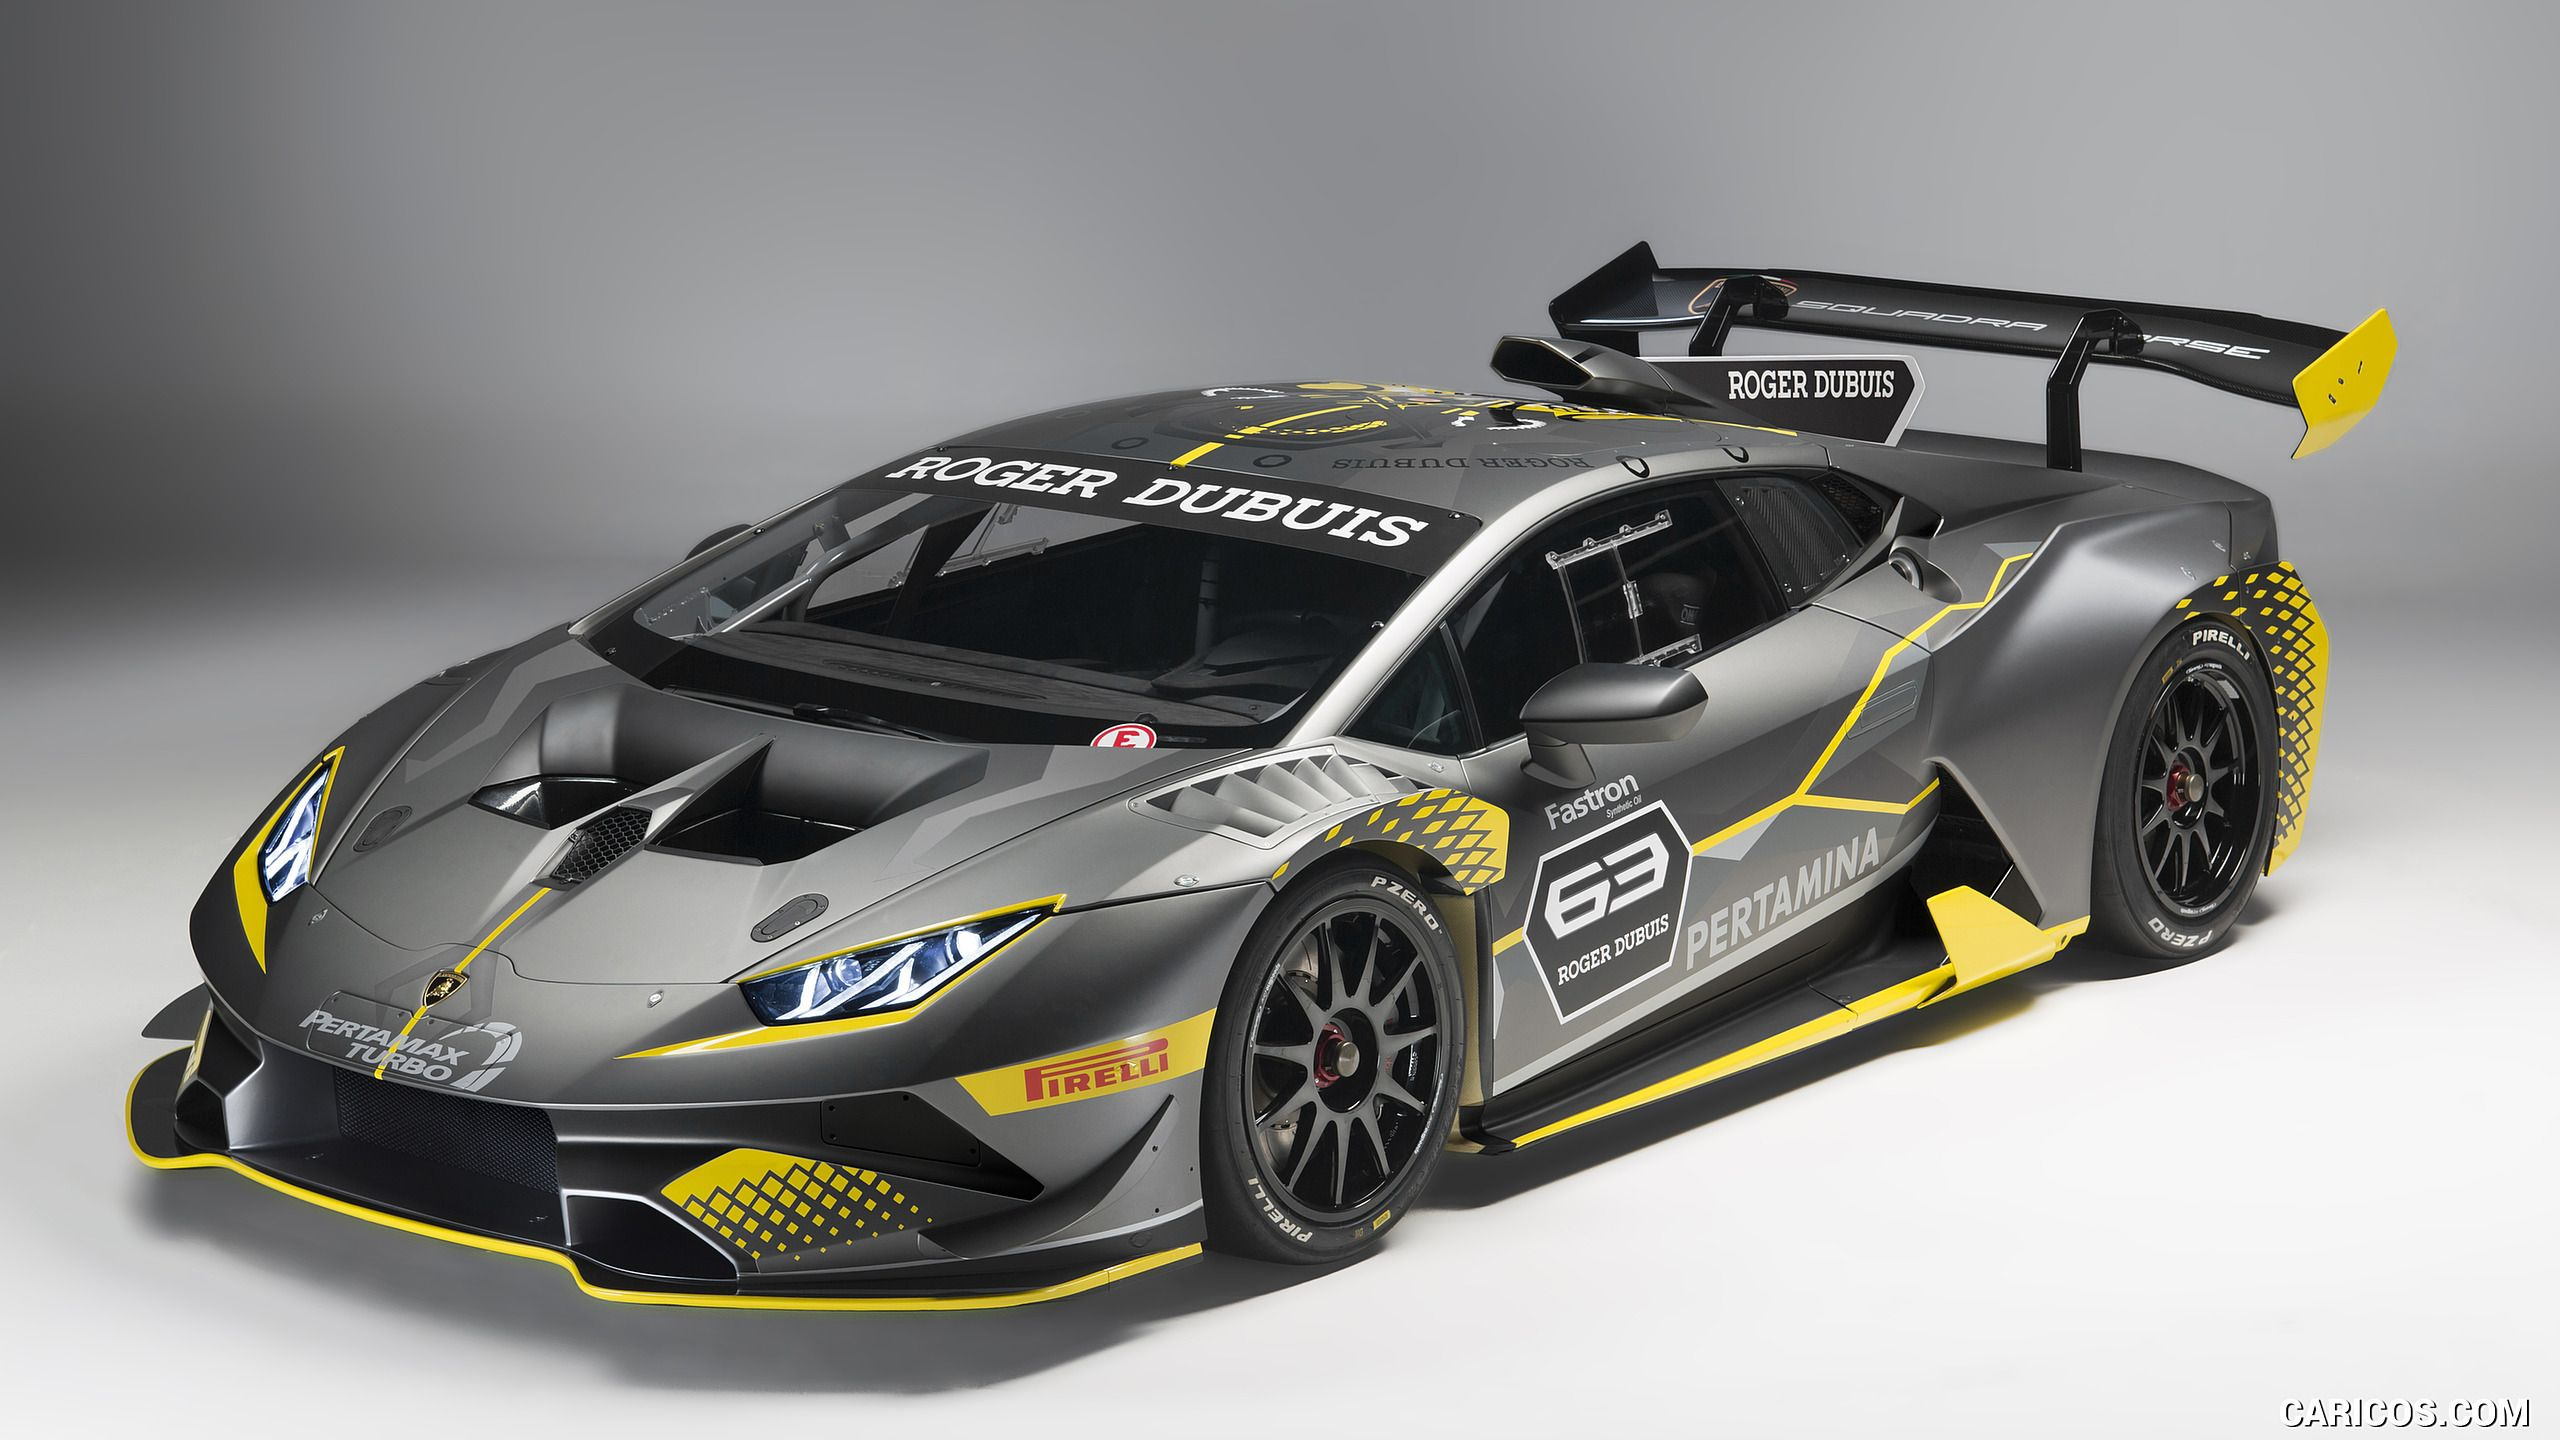 2018 Lamborghini Huracan Super Trofeo Evo Lamborghini Huracan Cool Sports Cars Lamborghini Cars